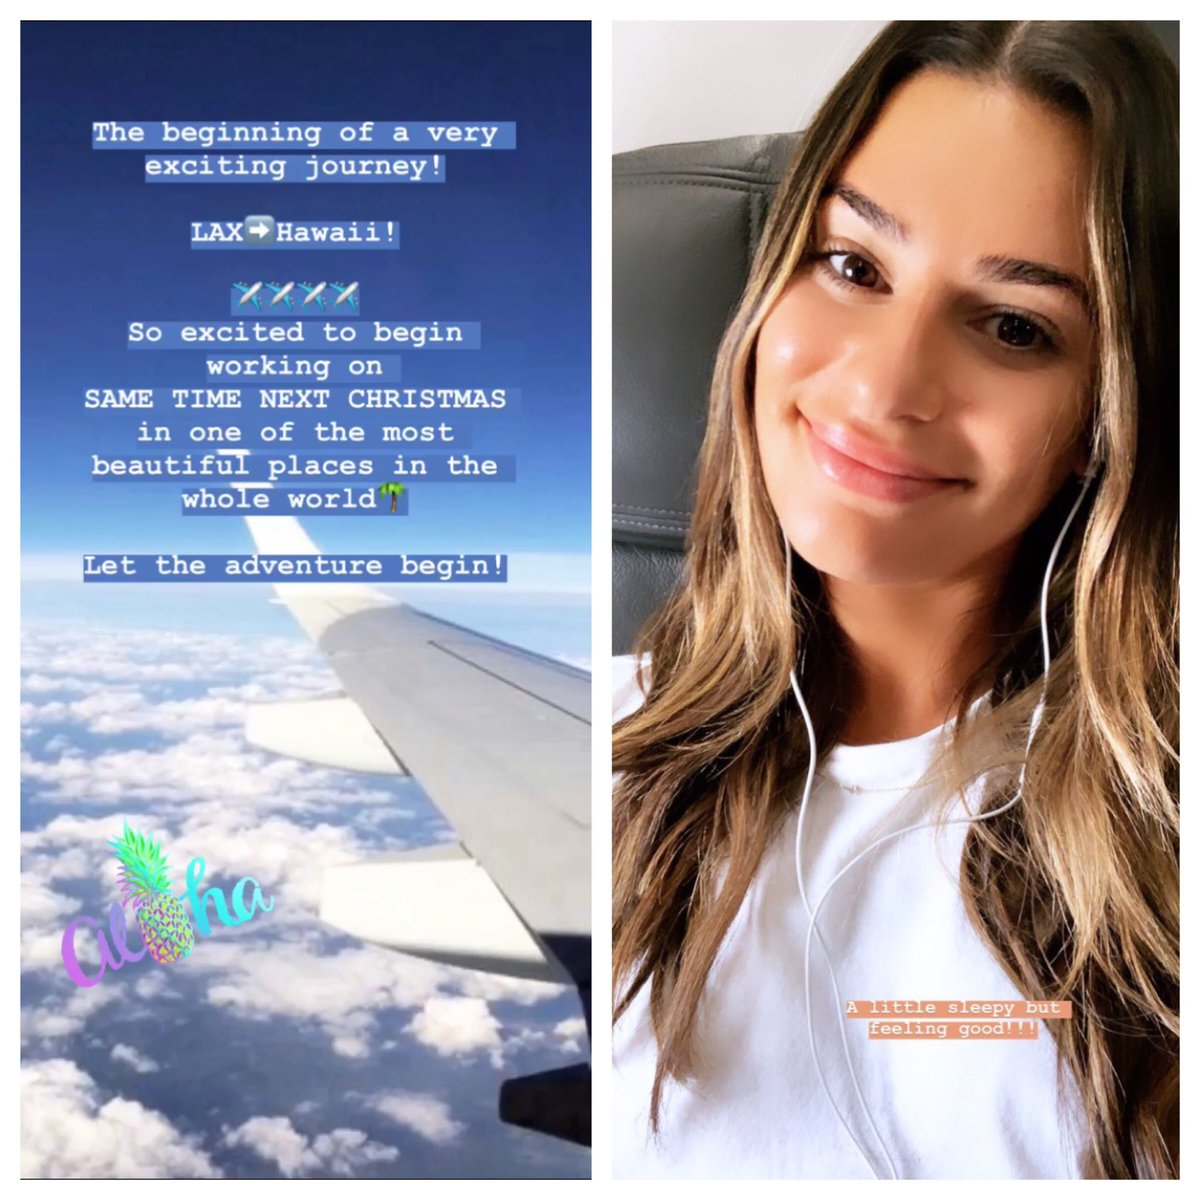 Christmas In Hawaii Movie.Reel News Hawaii On Twitter Lea Michele Is Inbound To Oahu